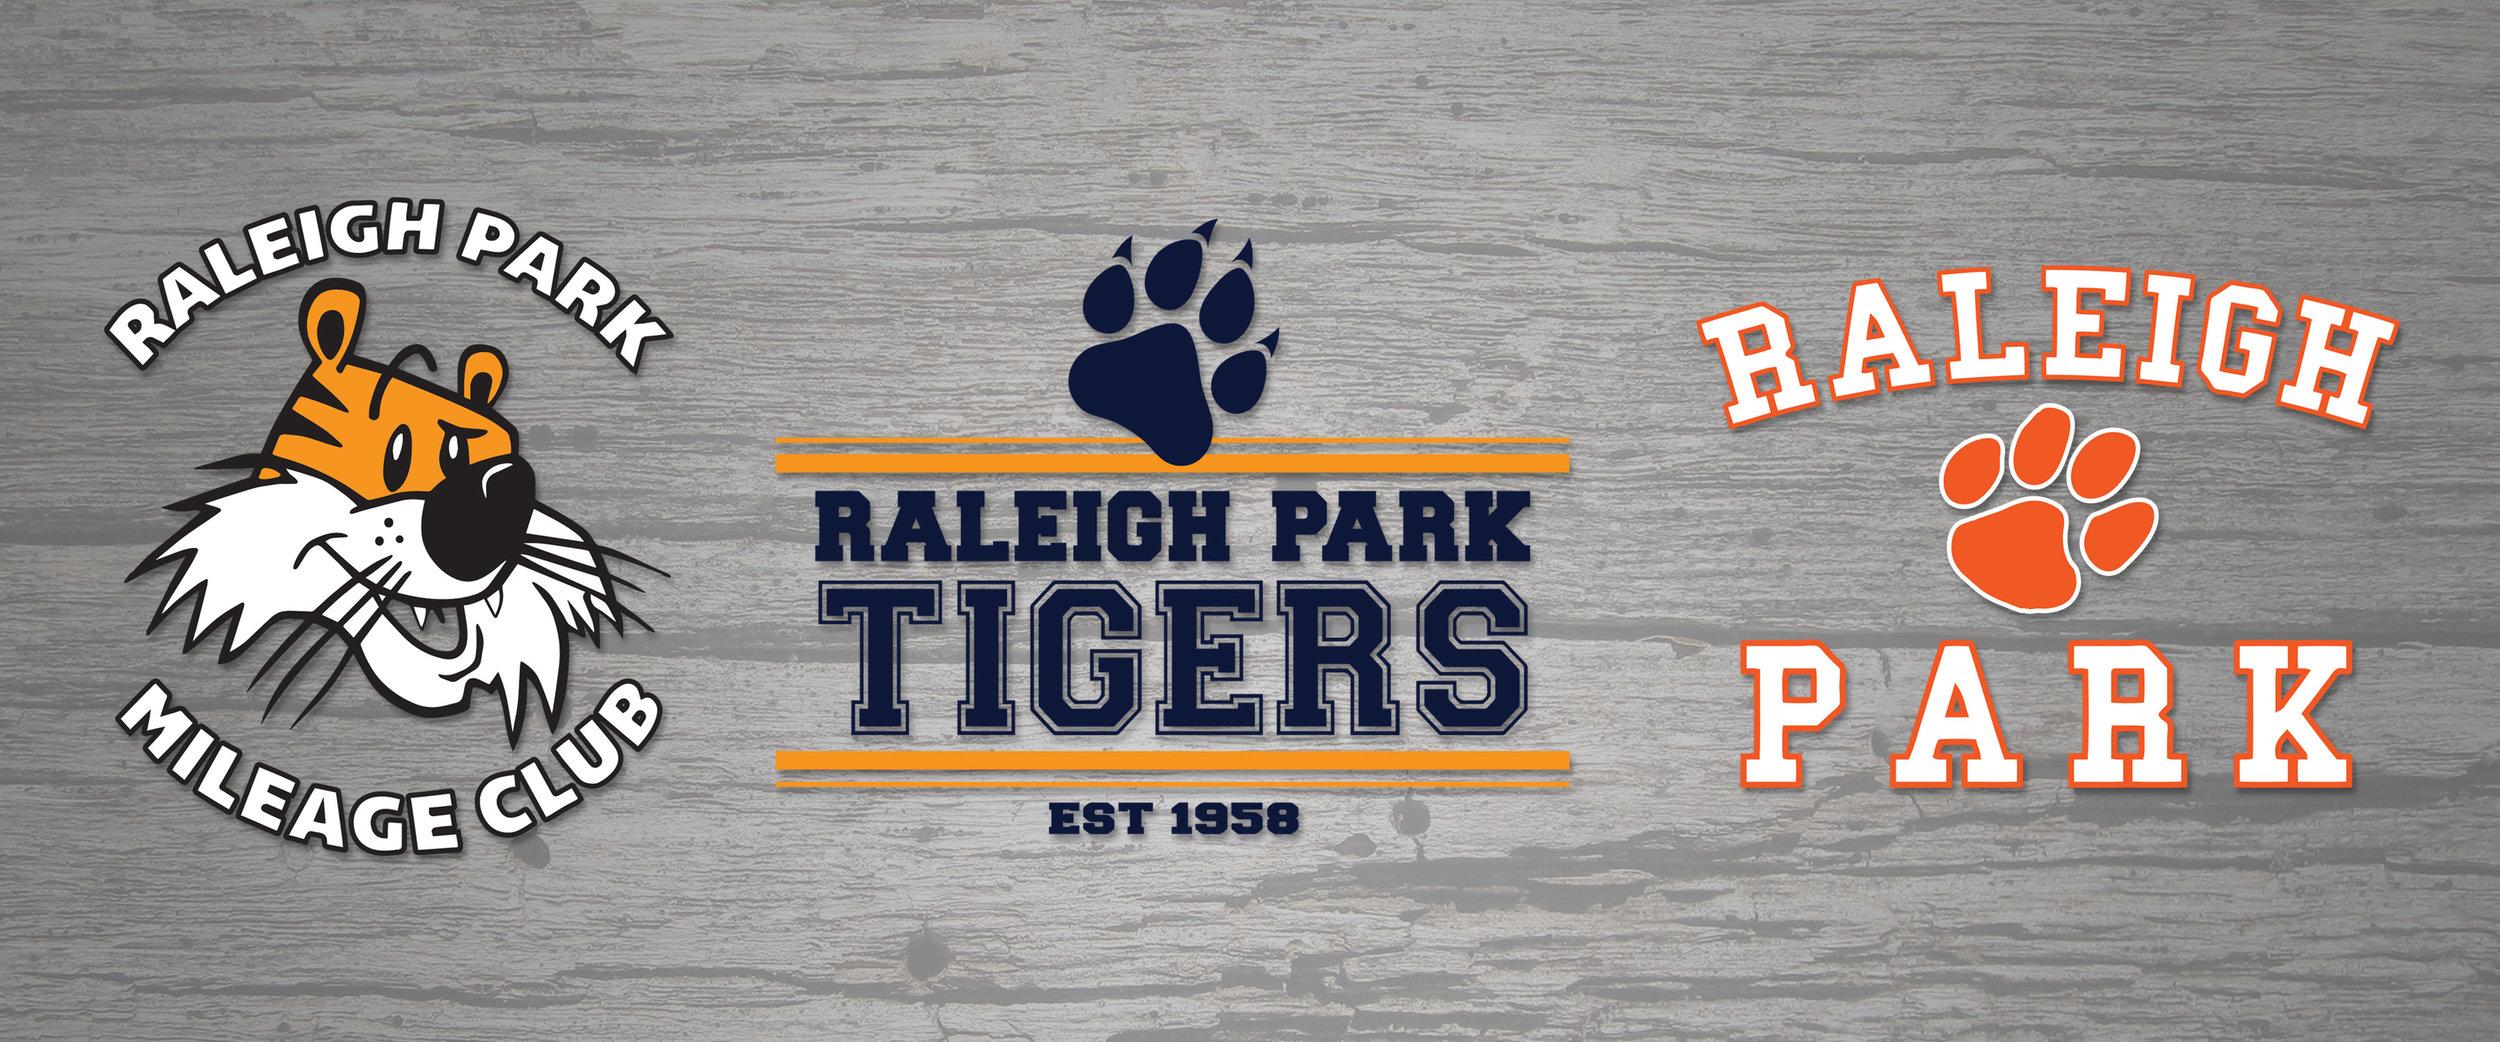 Wears My Shirt - Custom Products Anything - School Artwork Logo Raleigh Park 1.jpg